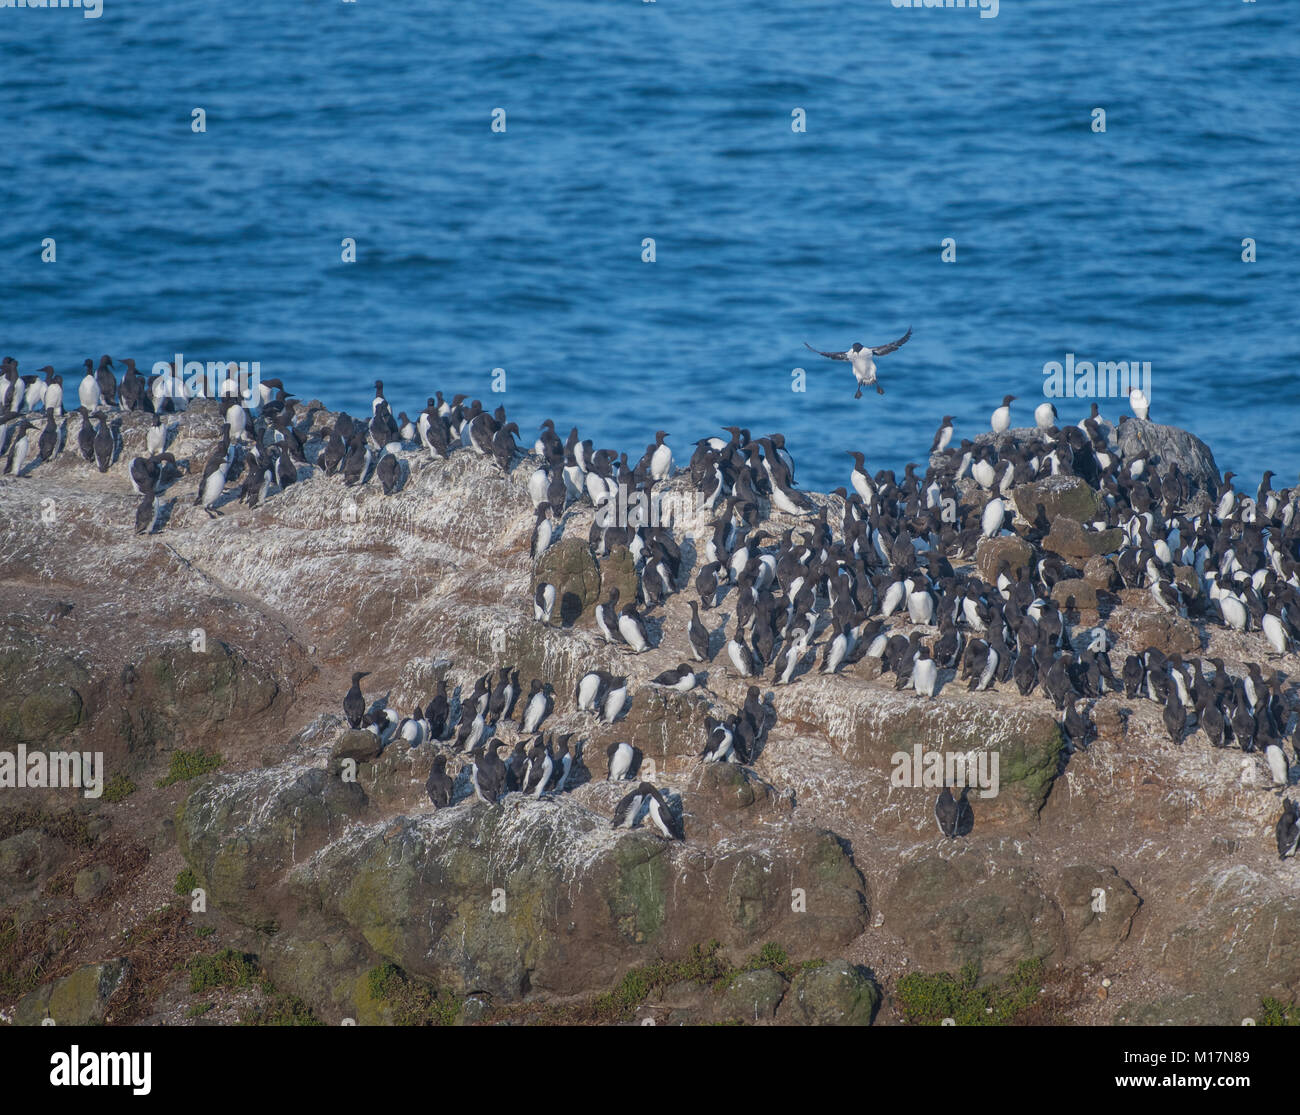 Common murre Nesting on Rock along Pacific coast - Stock Image